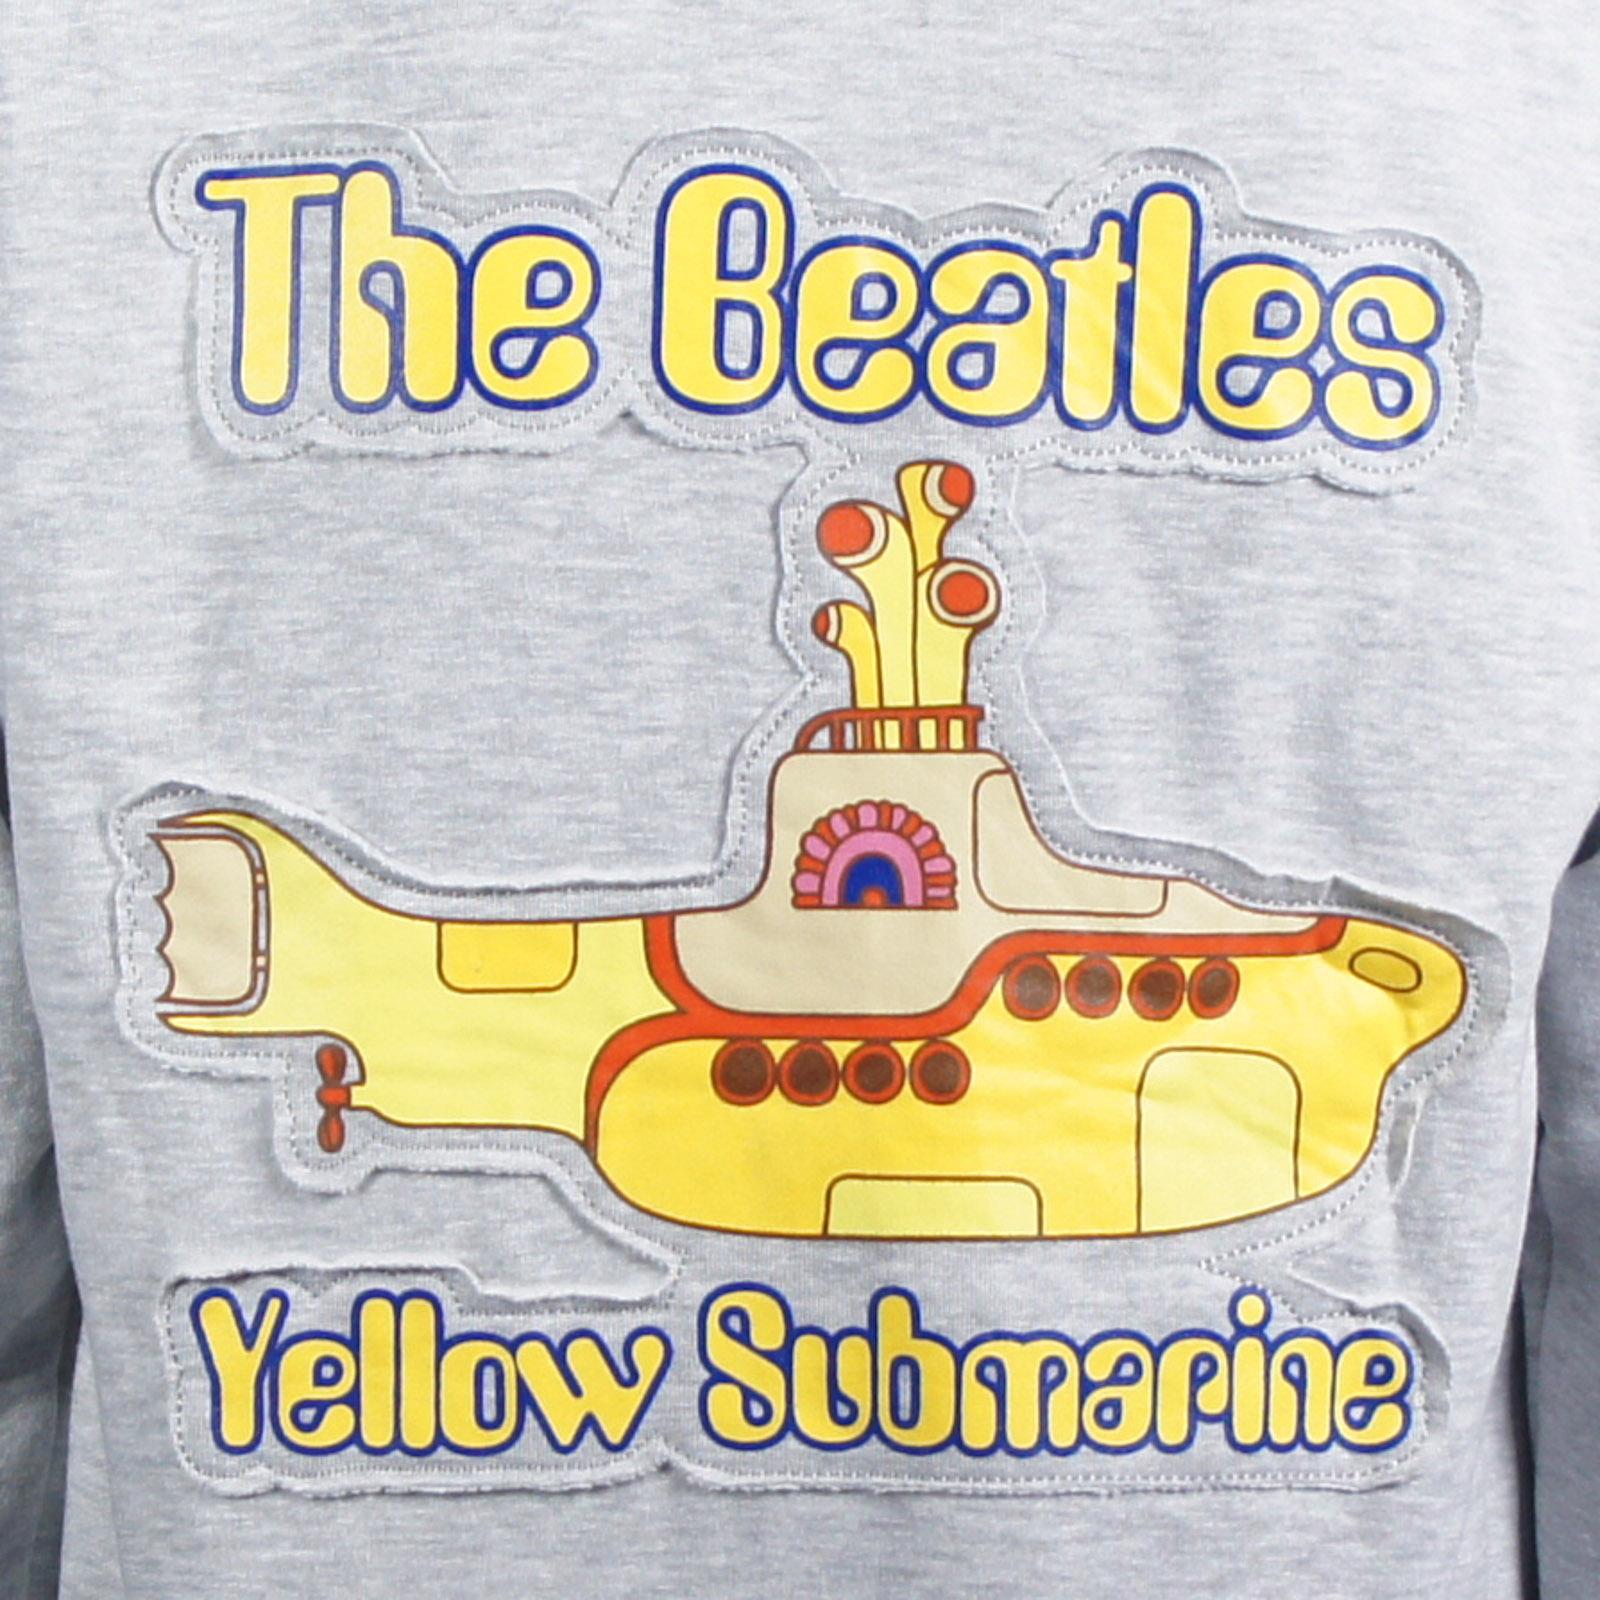 THE BEATLES Yellow Submarine Zipup Hoodie - Merch2rock